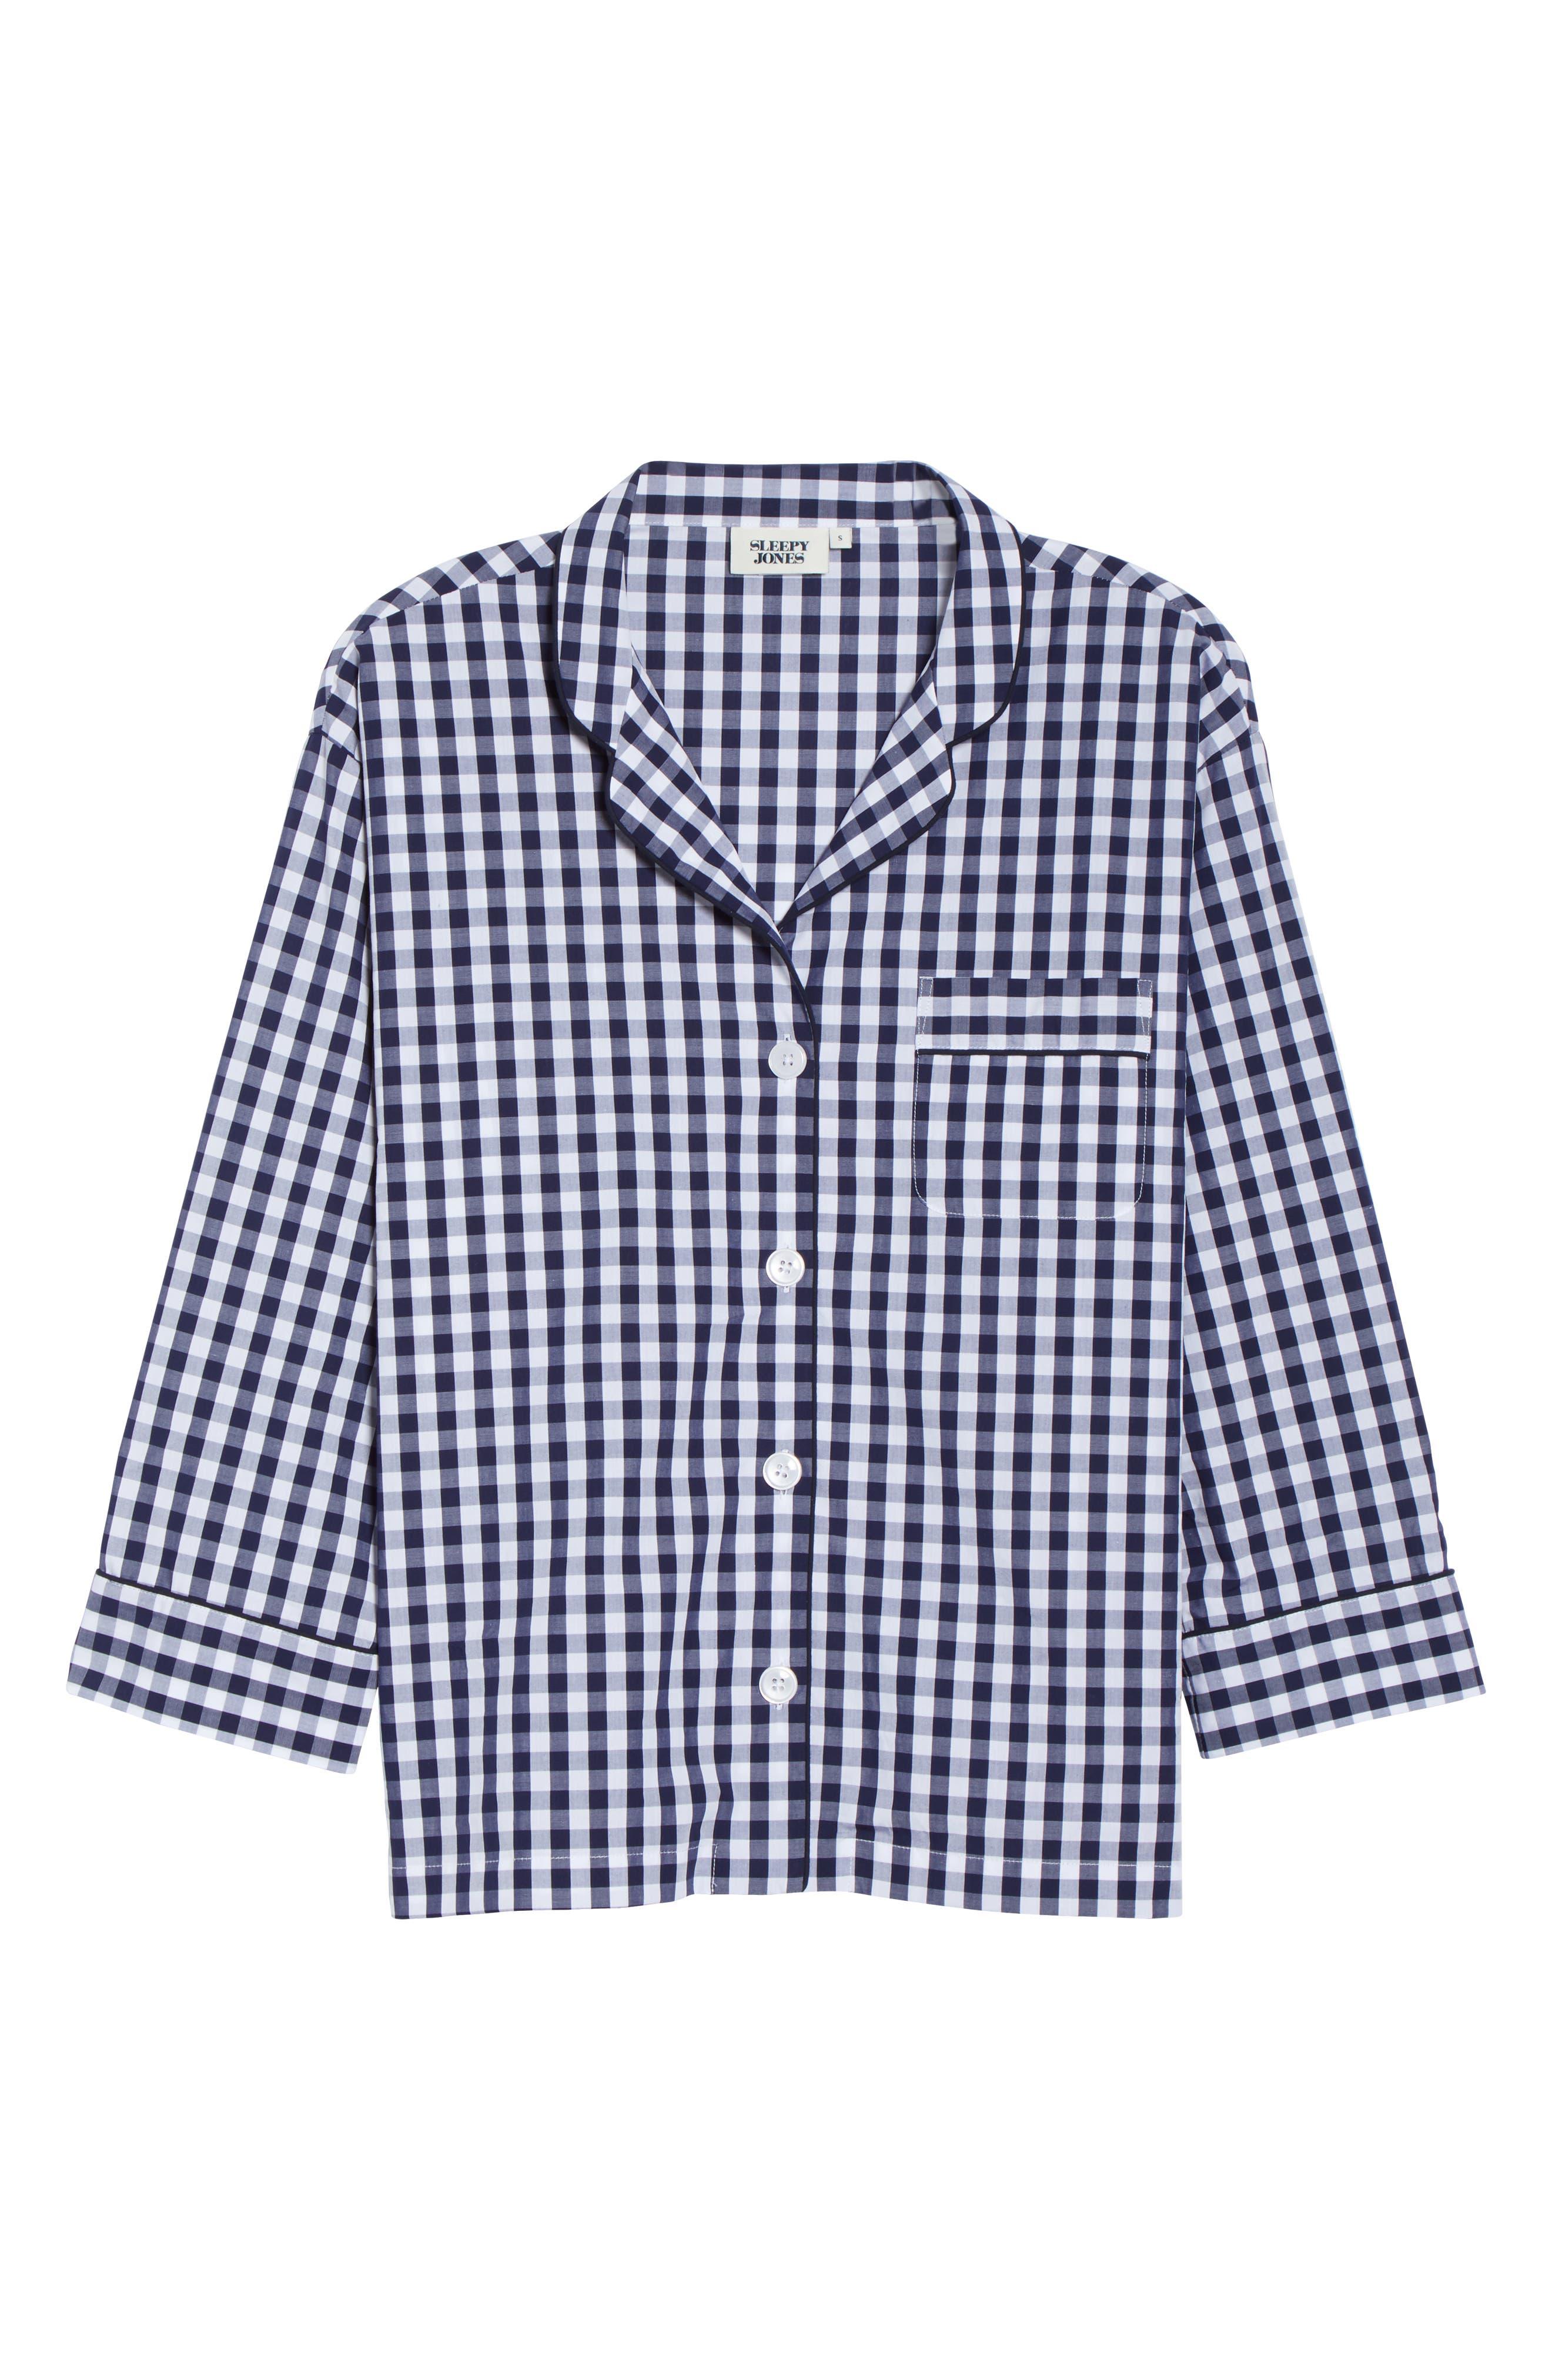 Marina Women's Pajama Shirt,                         Main,                         color, LARGE GINGHAM BLUE